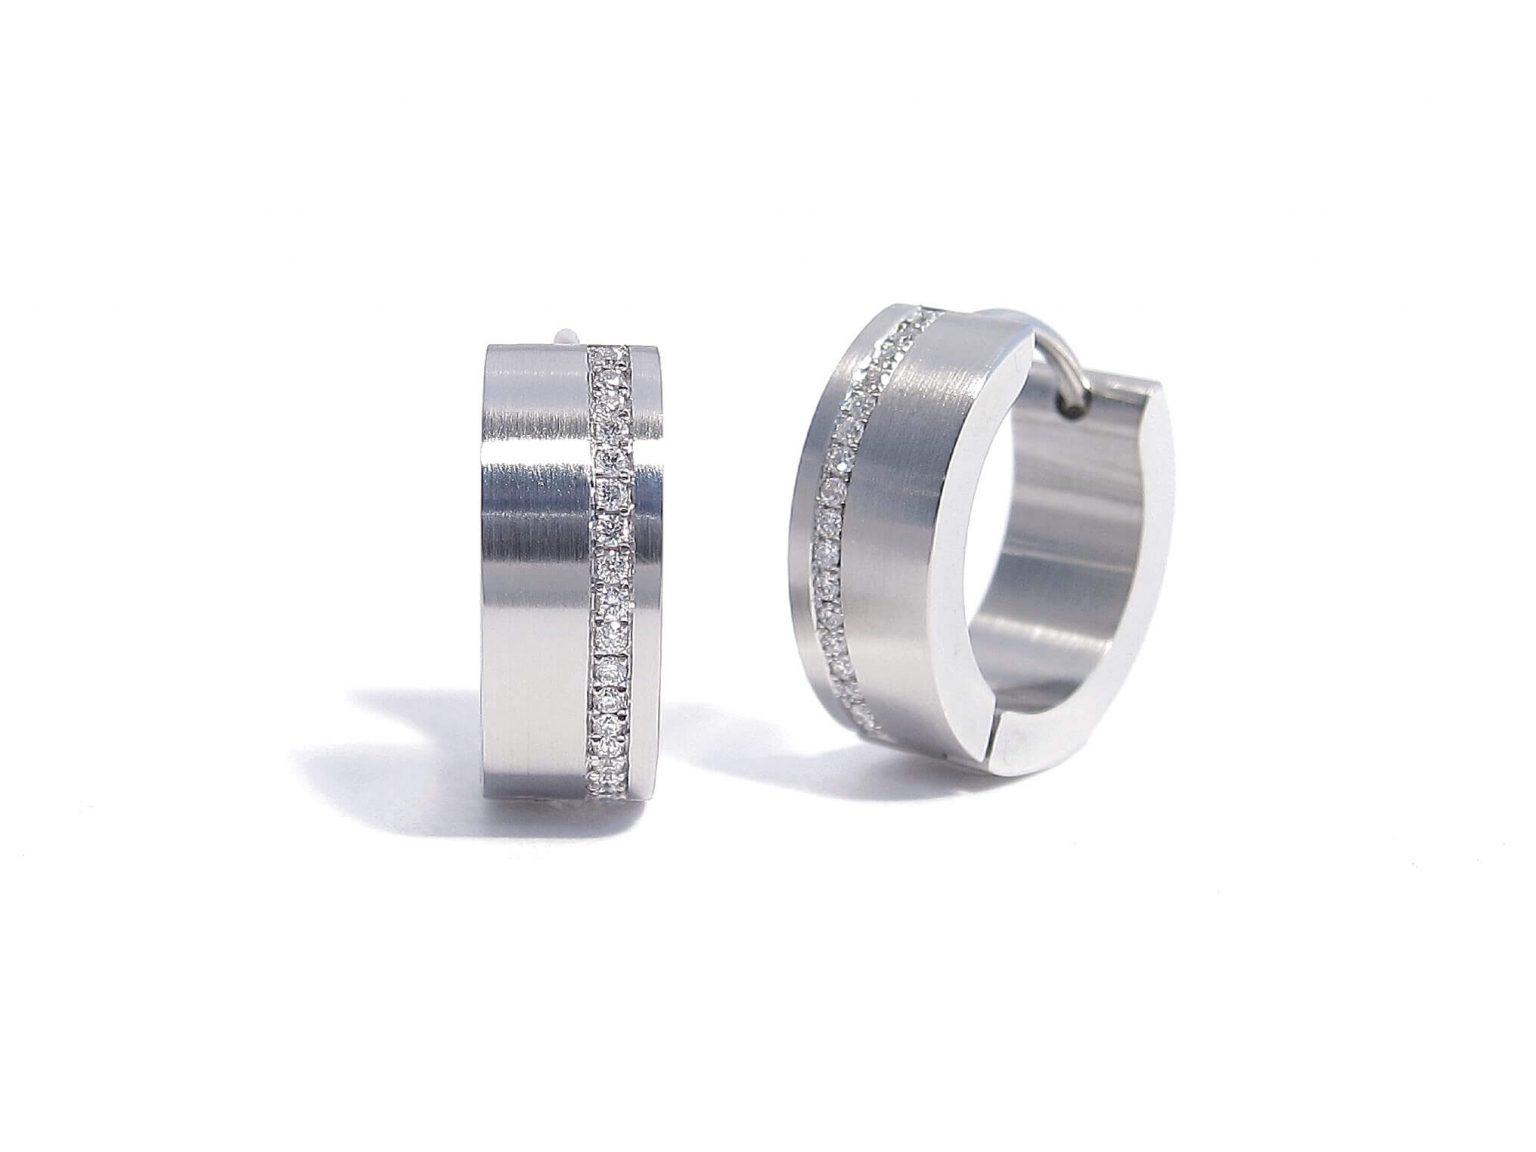 steel and diamond earrings